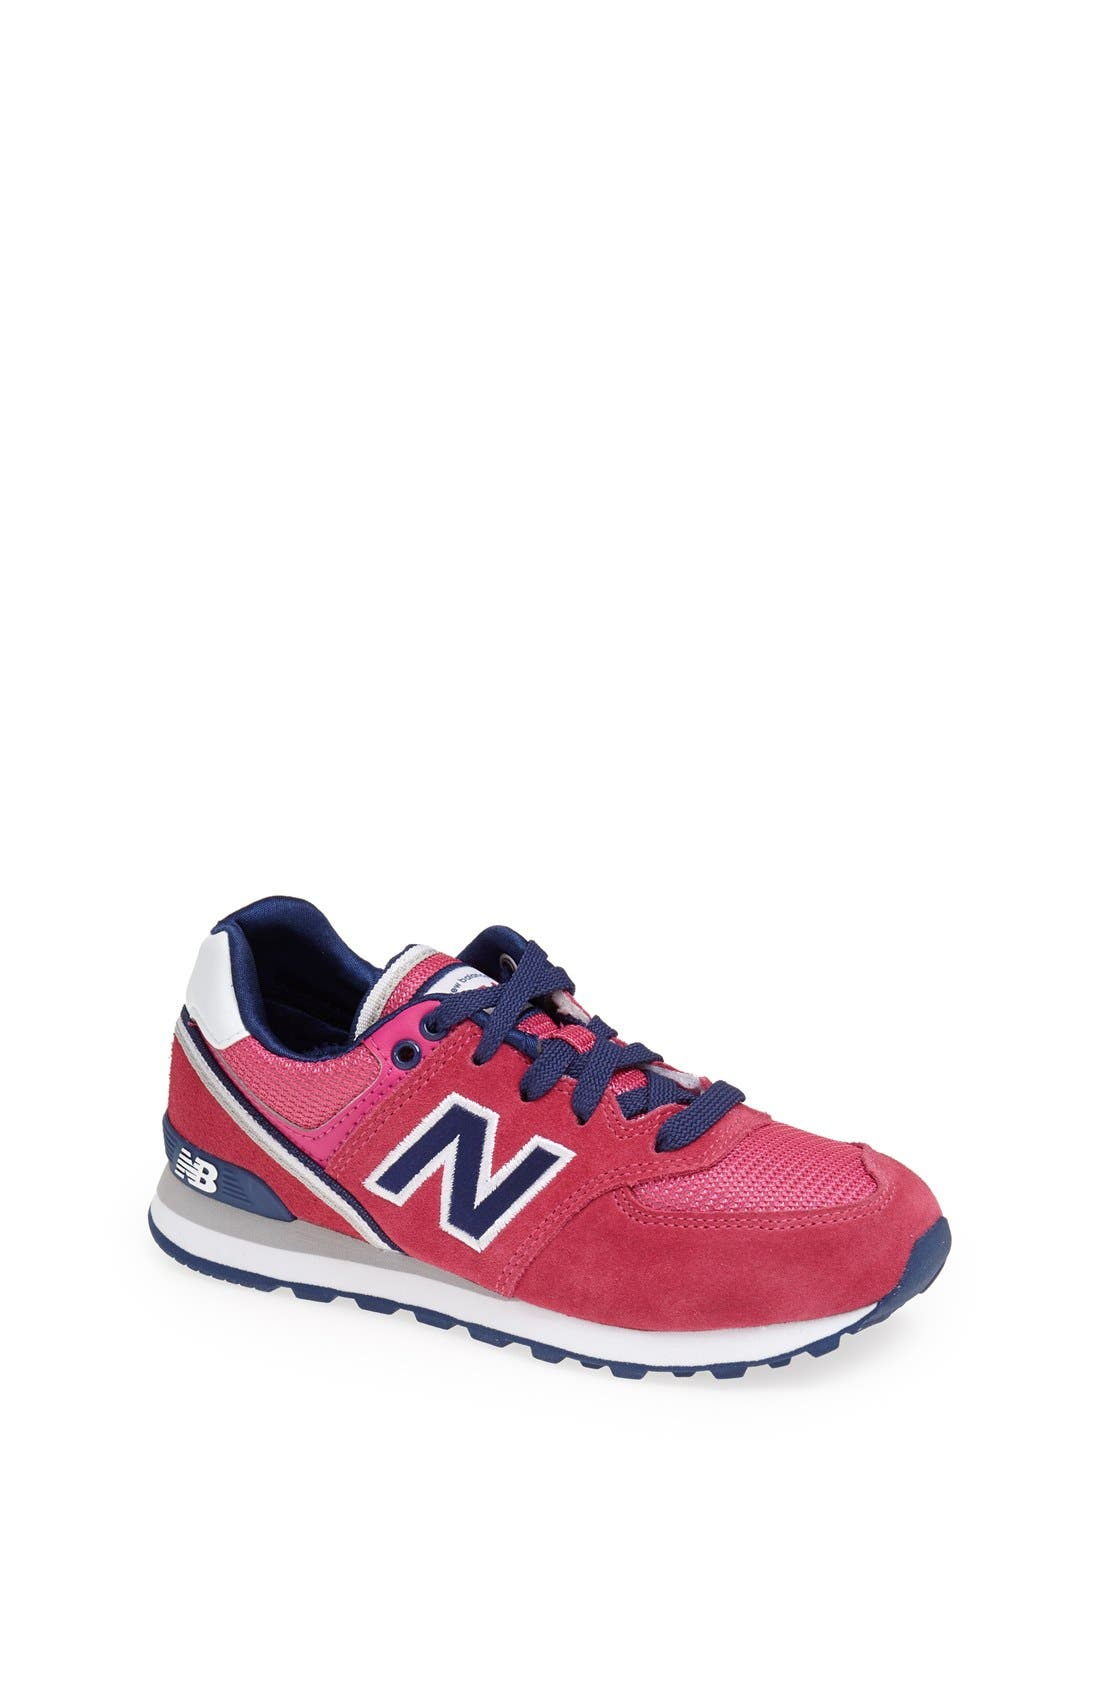 Main Image - New Balance '574 - SJ' Sneaker (Toddler, Little Kid & Big Kid)